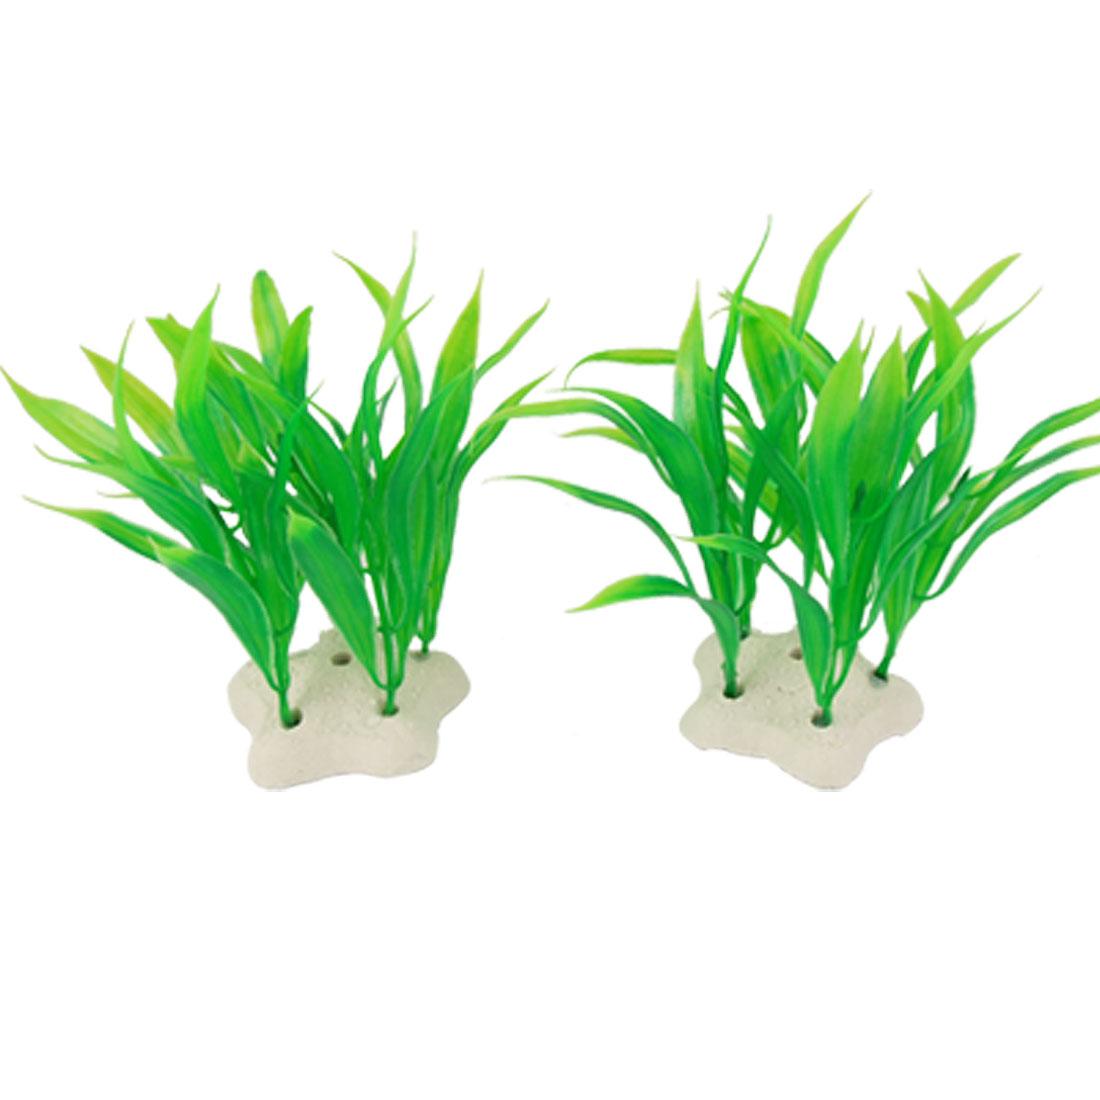 2 Pcs Emulational Green Plastic Plants Decoration for Fish Tank Aquarium